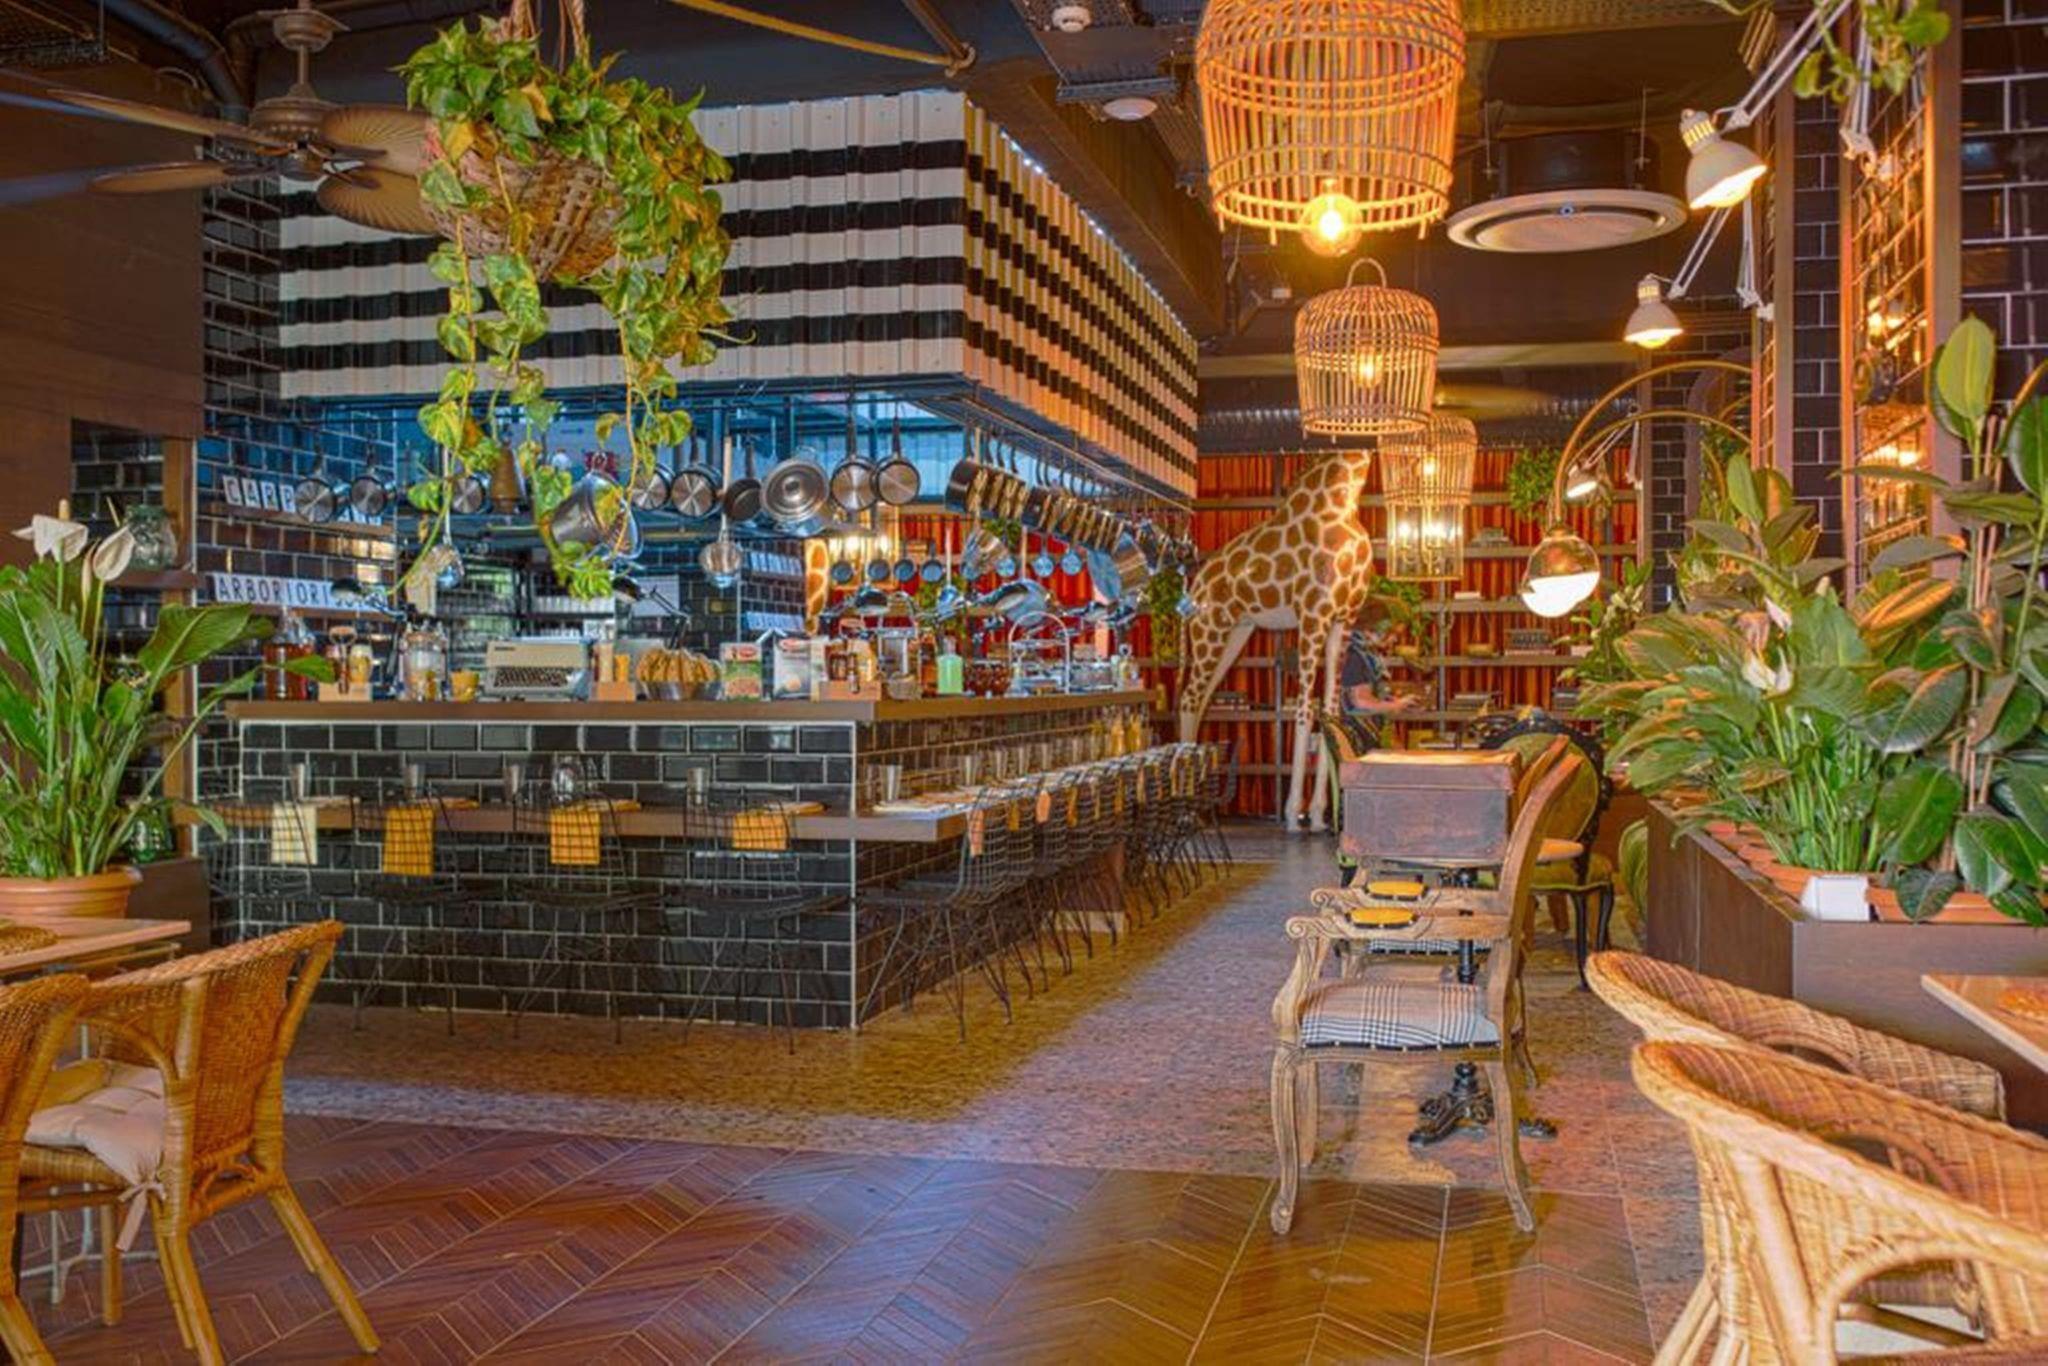 http://www.orextravel.sk/OREX/hotelphotos/anjeliq-downtown-hotel-general-0015.jpg